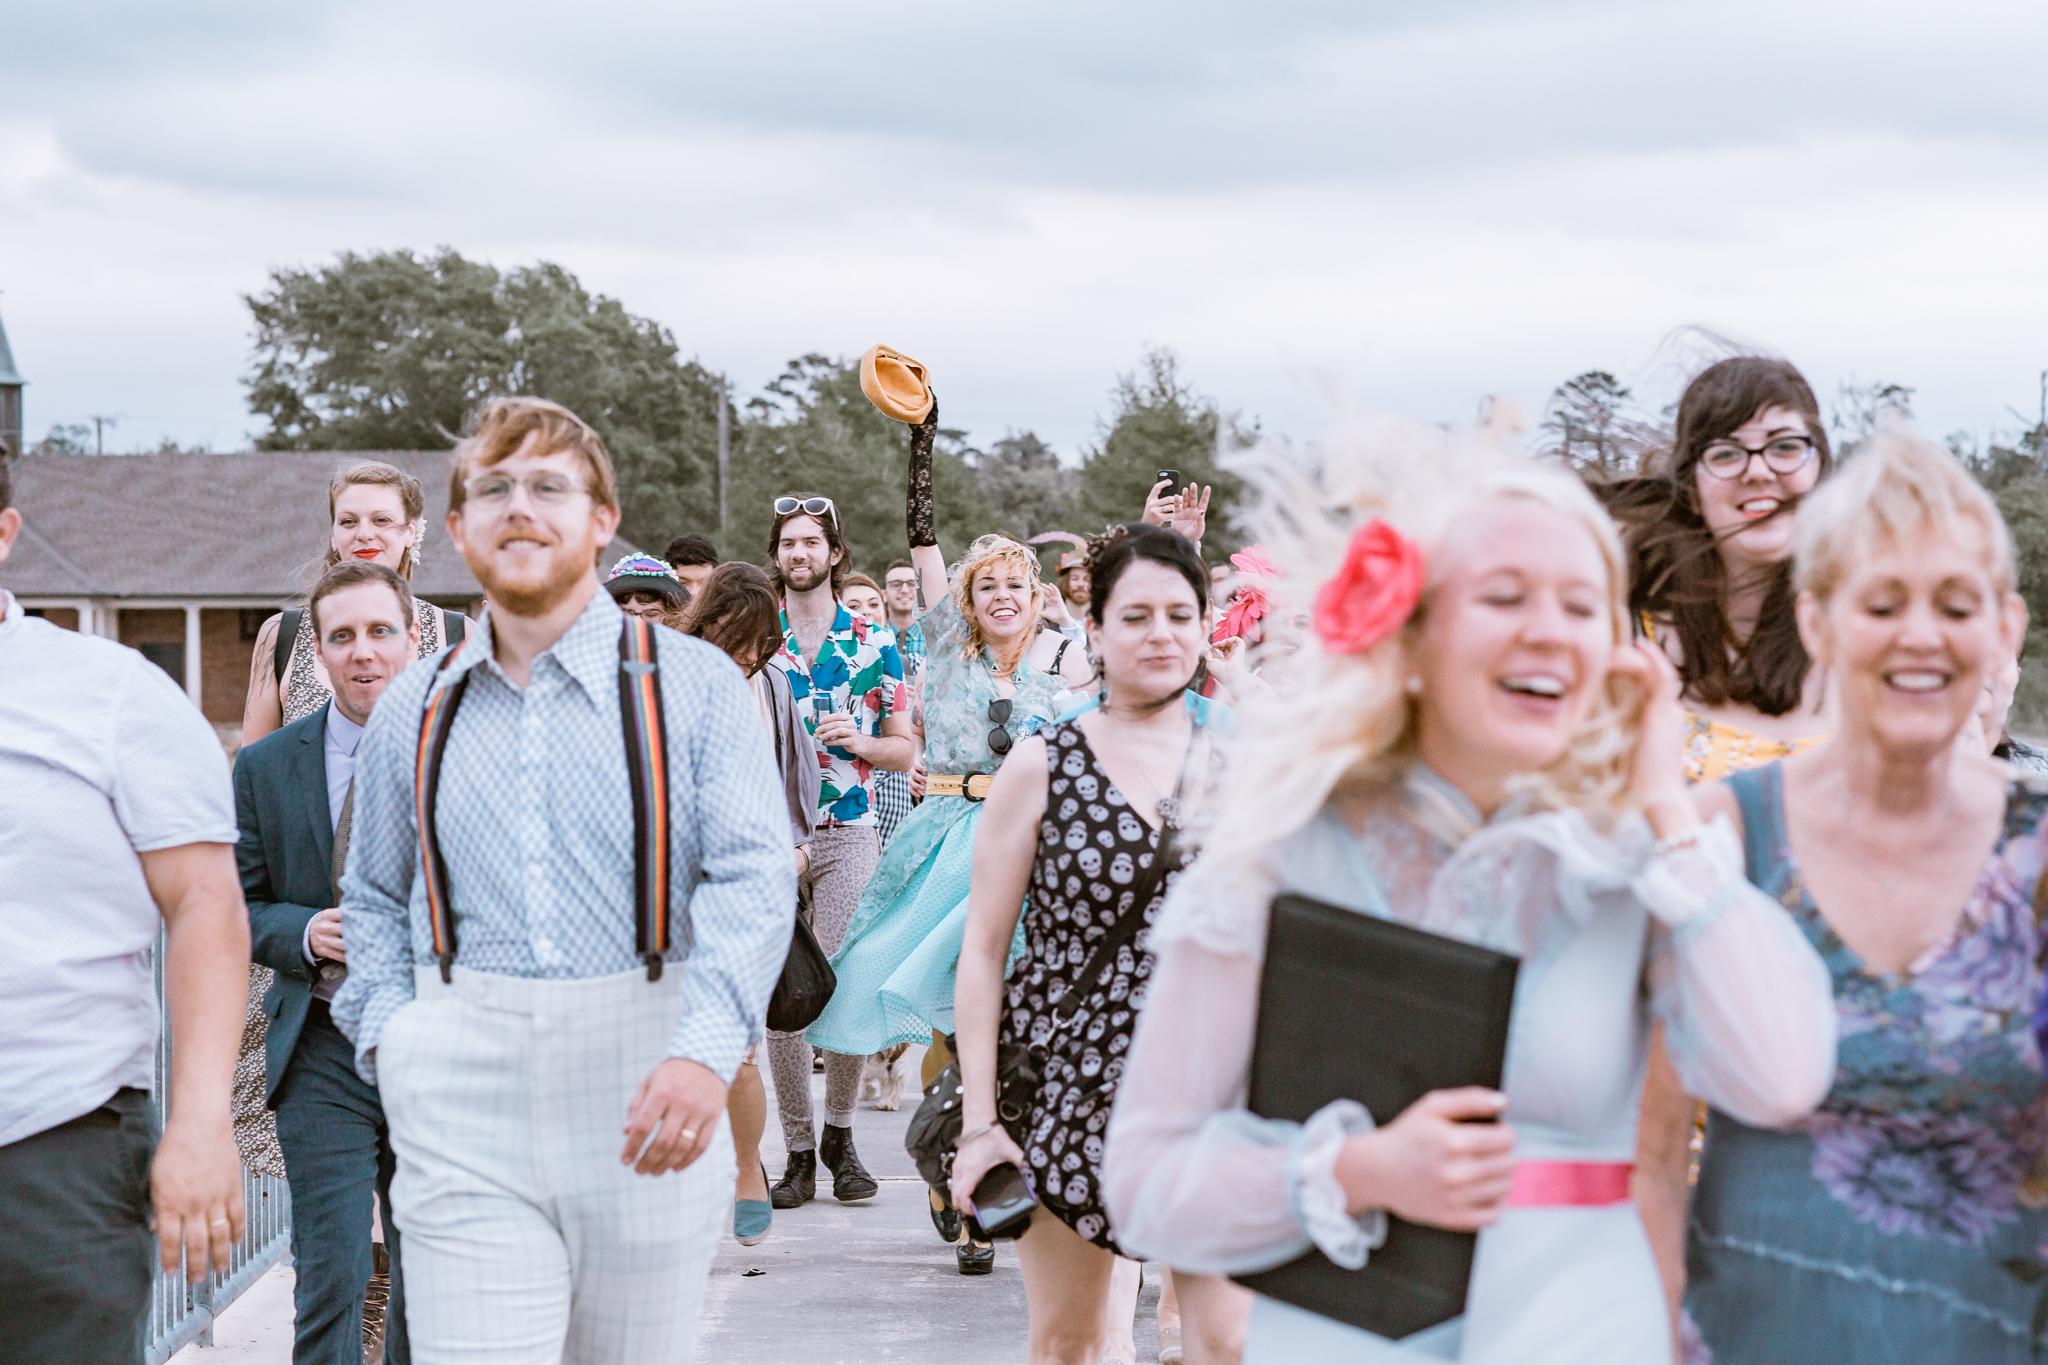 Tim and David - New orleans Wedding - Kallistia Photography-11.jpg